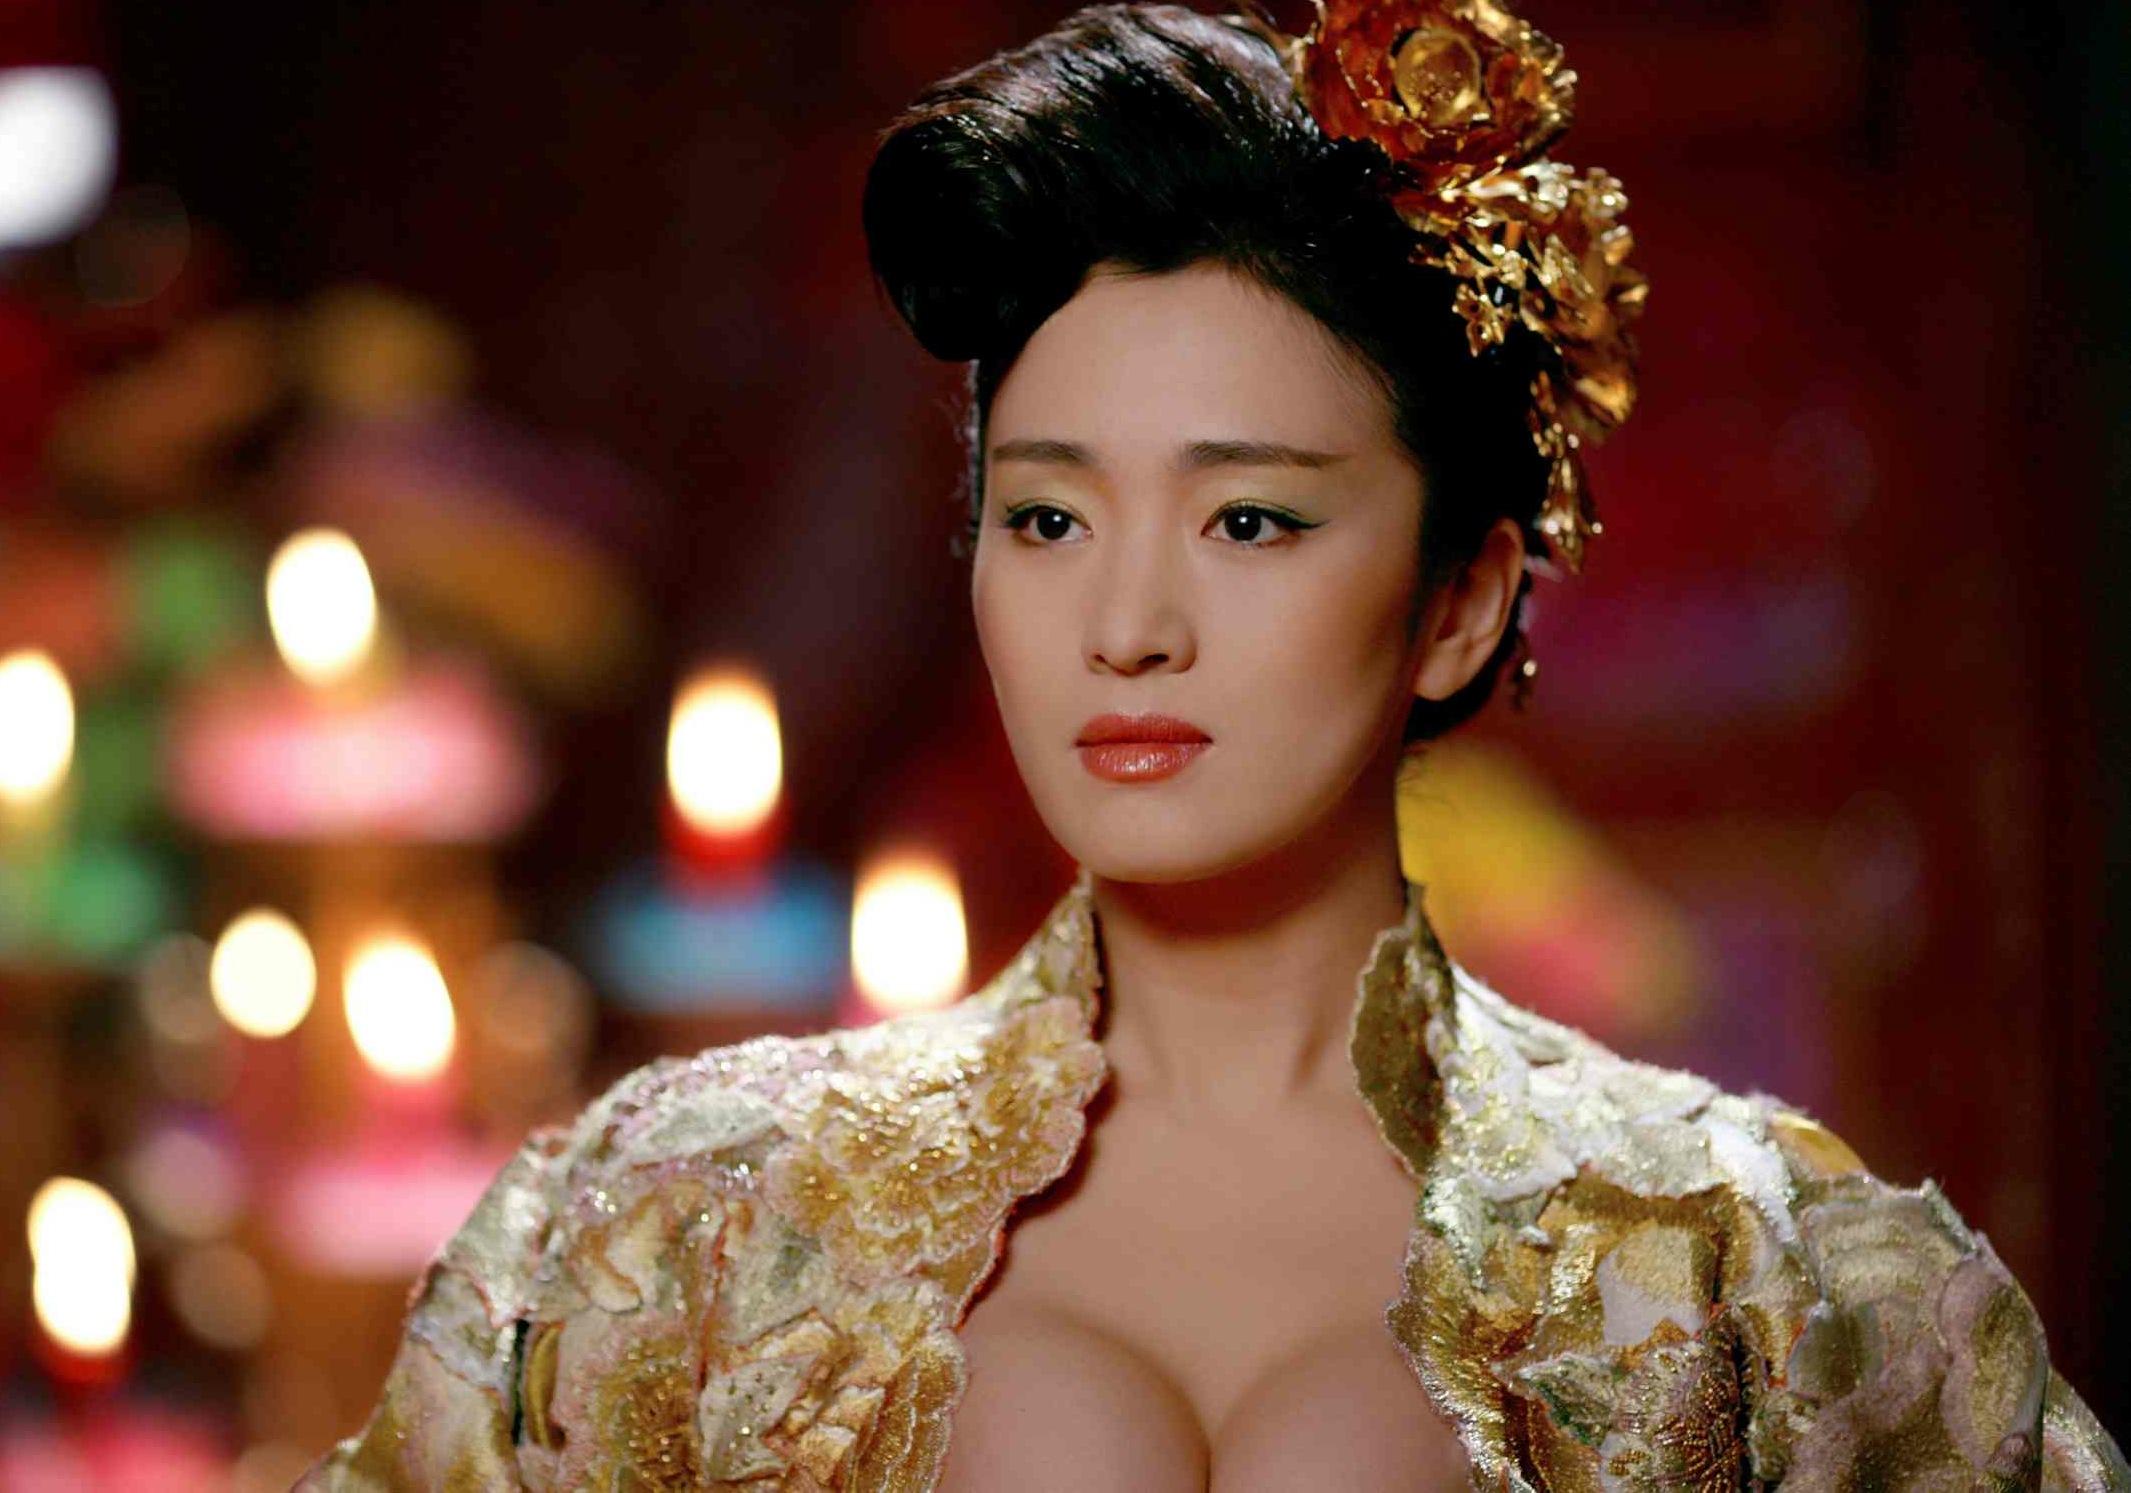 Азиатки видео смотреть онлайн